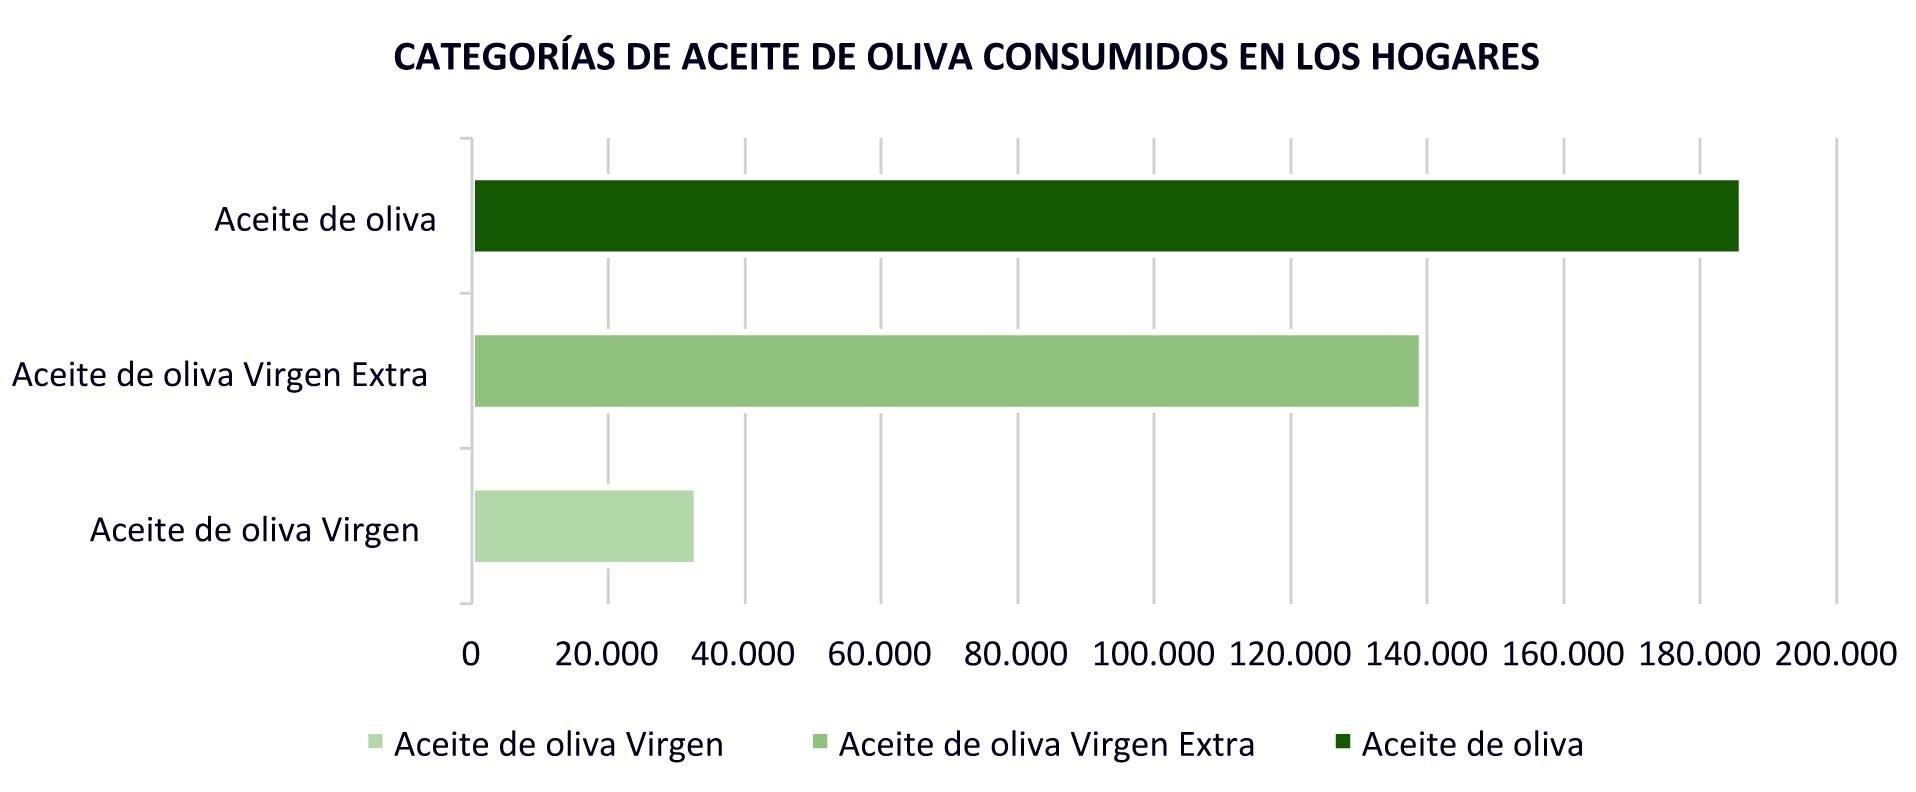 consumo aceite de oliva por calidades